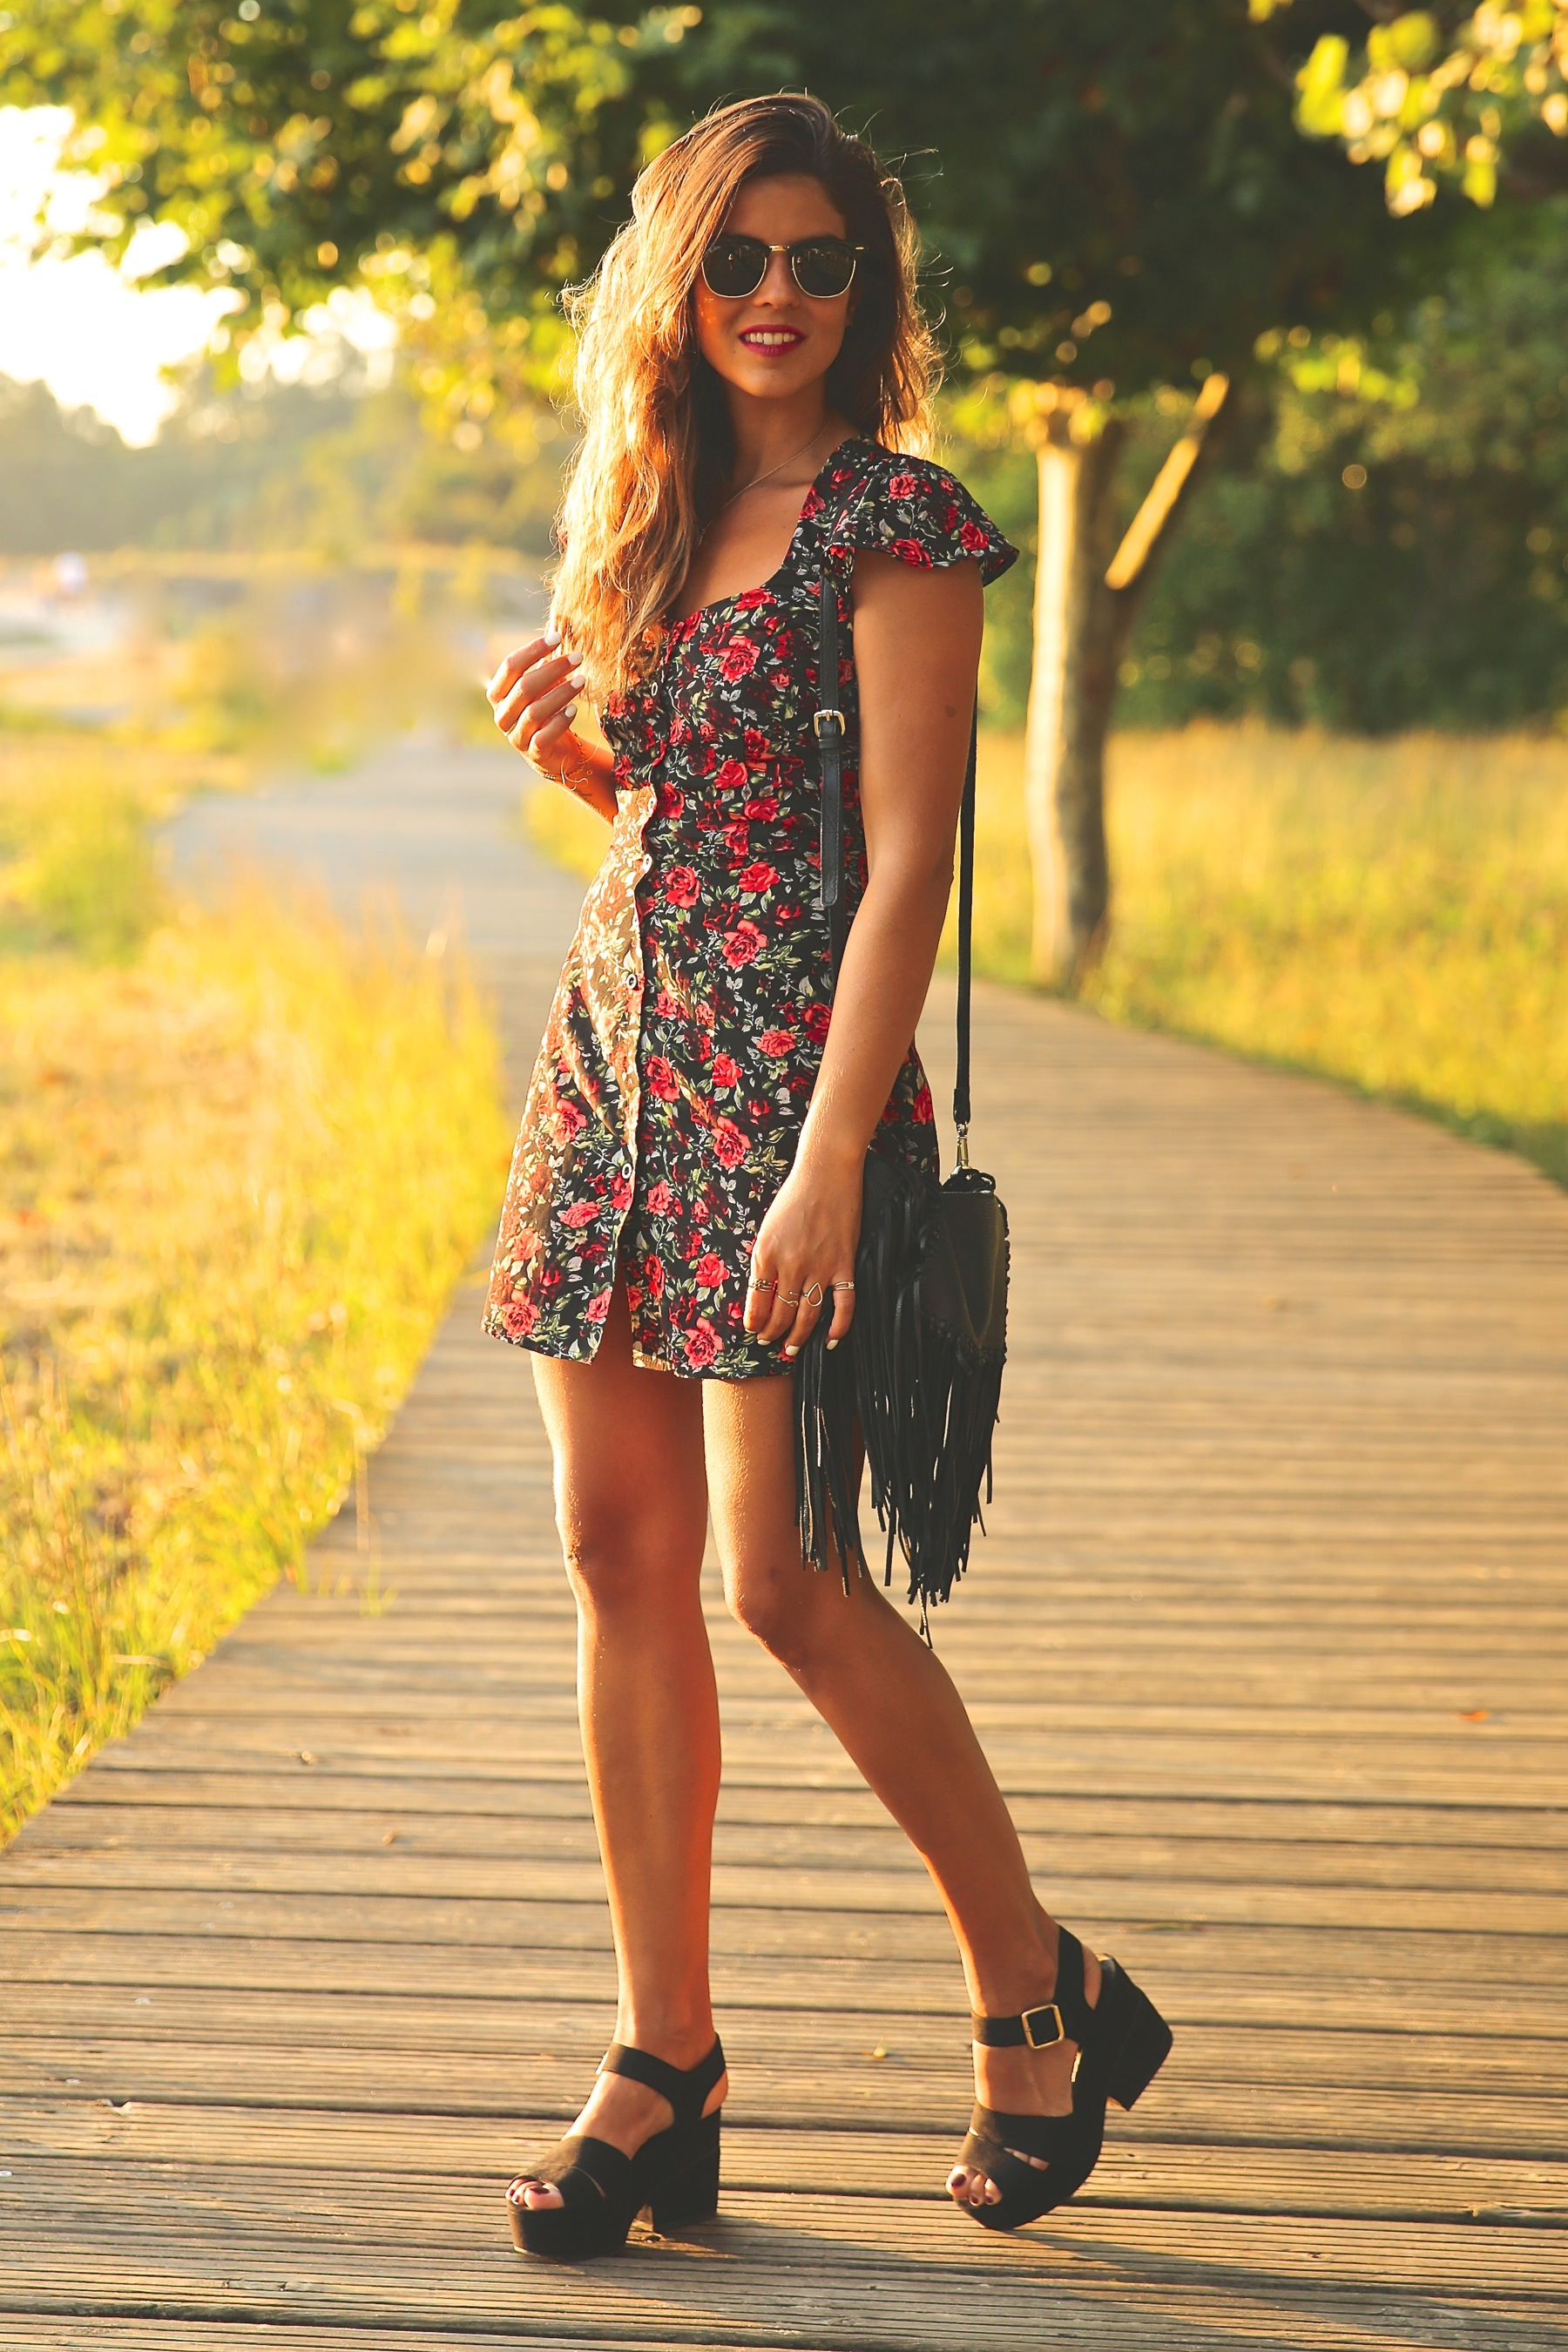 trendy_taste-look-outfit-street_style-ootd-blog-blogger-fashion_spain-moda_españa-flower_print-dress-vestido-flores-sandalias_negras-black_sandals-platforms-sunset-playa-beach-summer-15